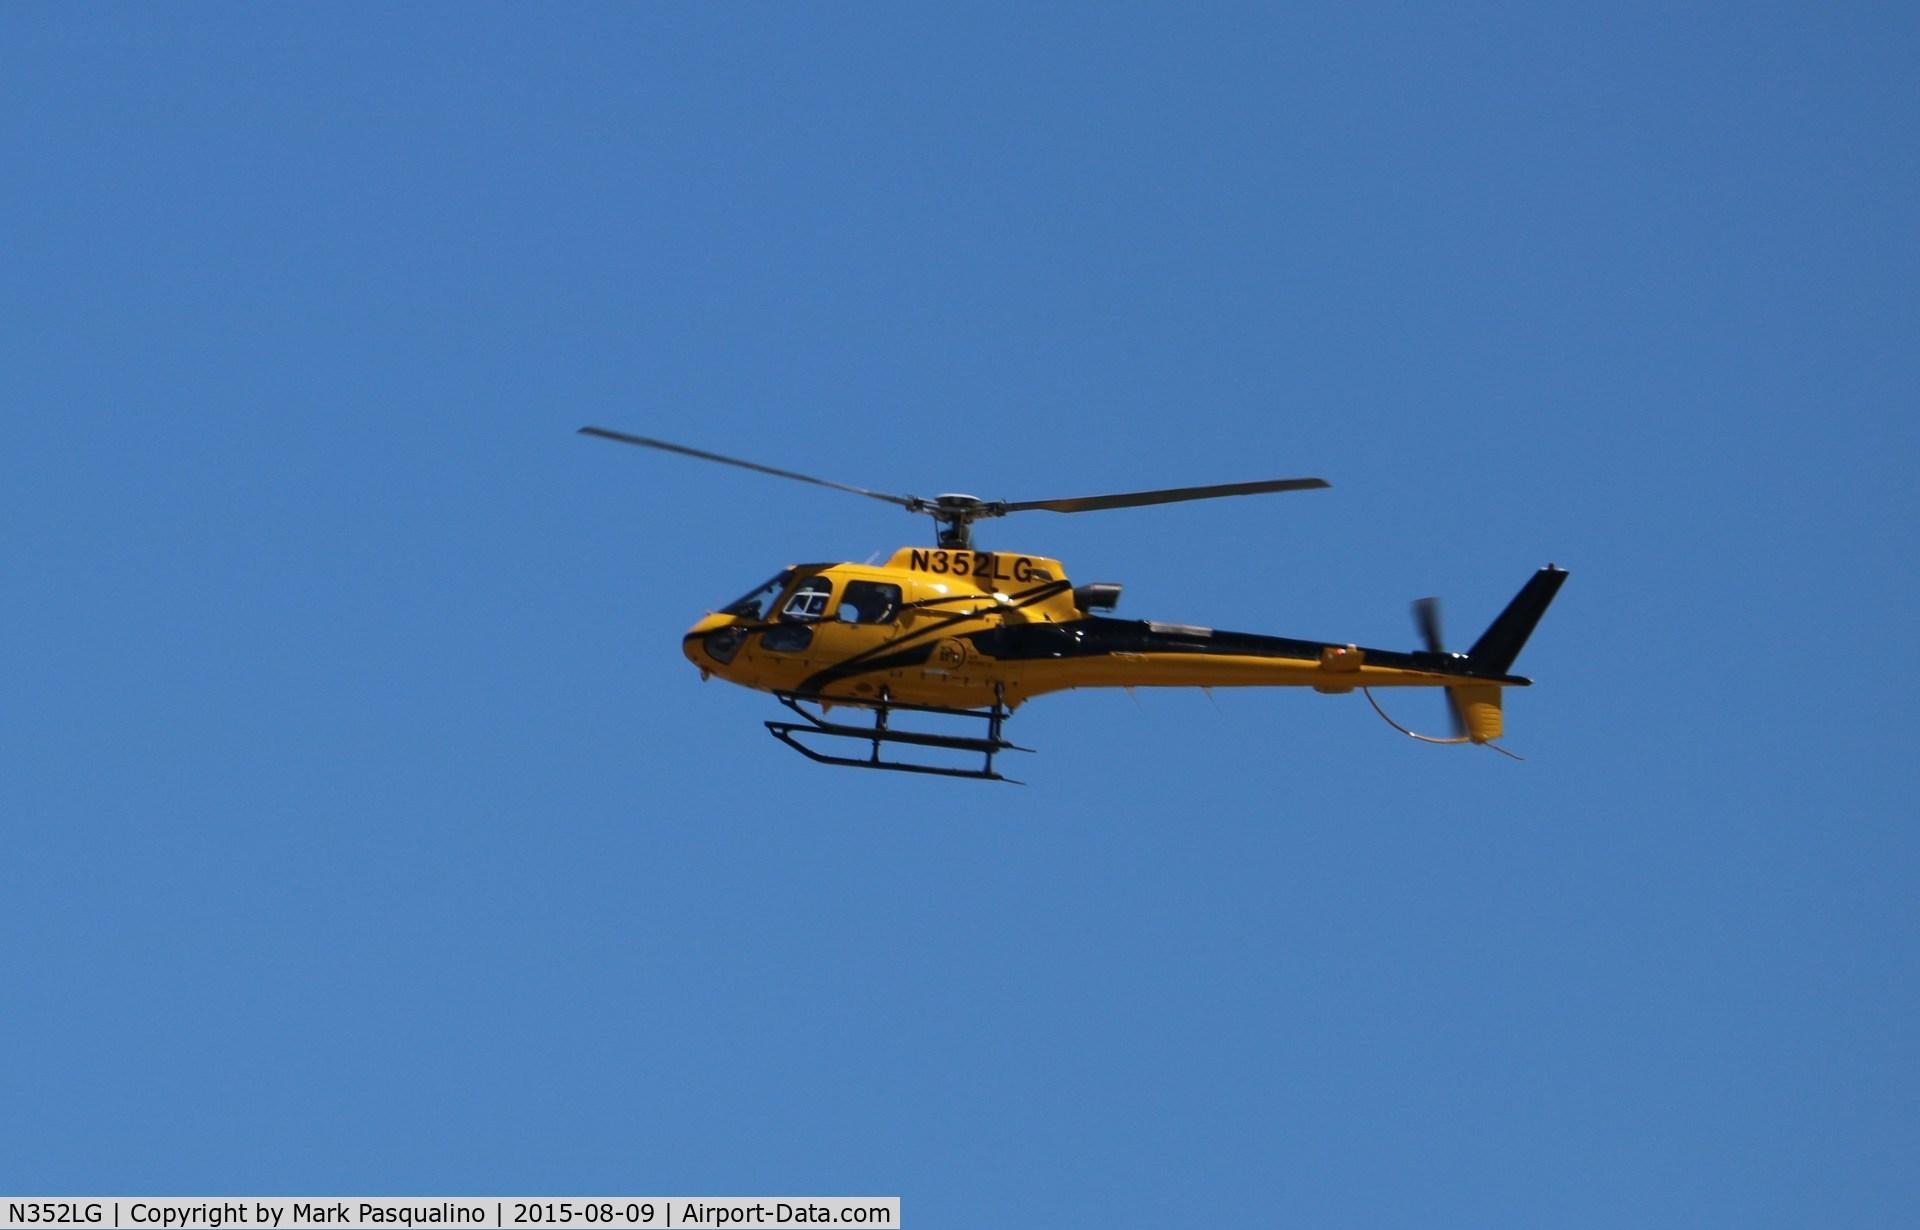 N352LG, Eurocopter AS-350B-3 Ecureuil C/N 3777, Eurocopter AS-350B-3